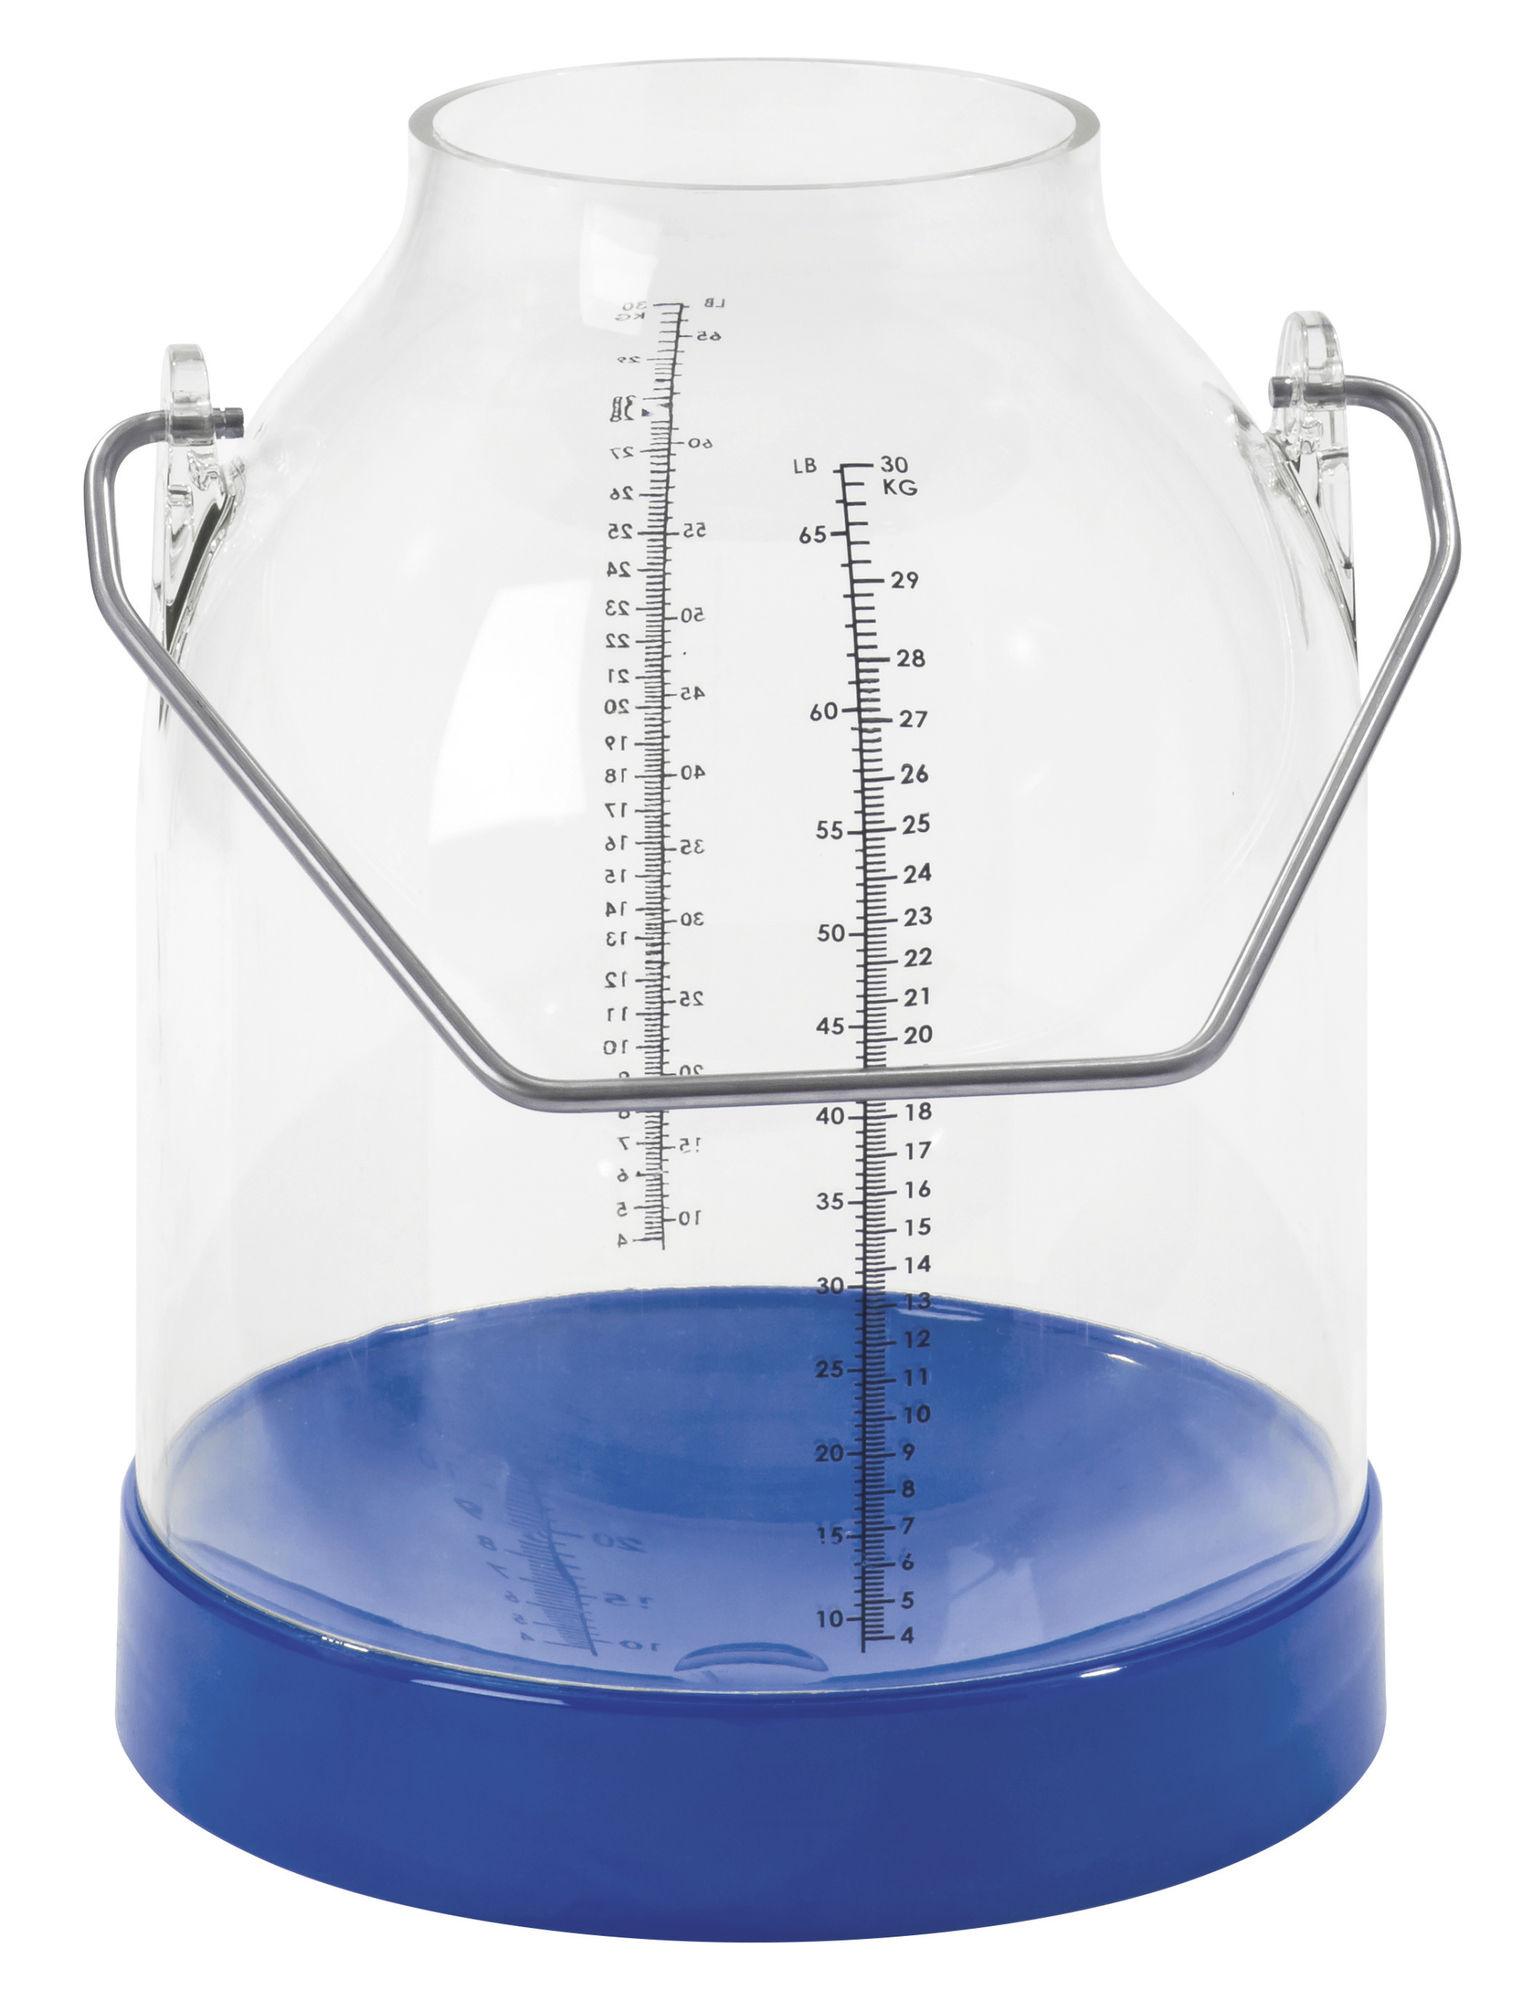 Melkeimer 30 Liter mit Skala blau, Bügelhöhe 117